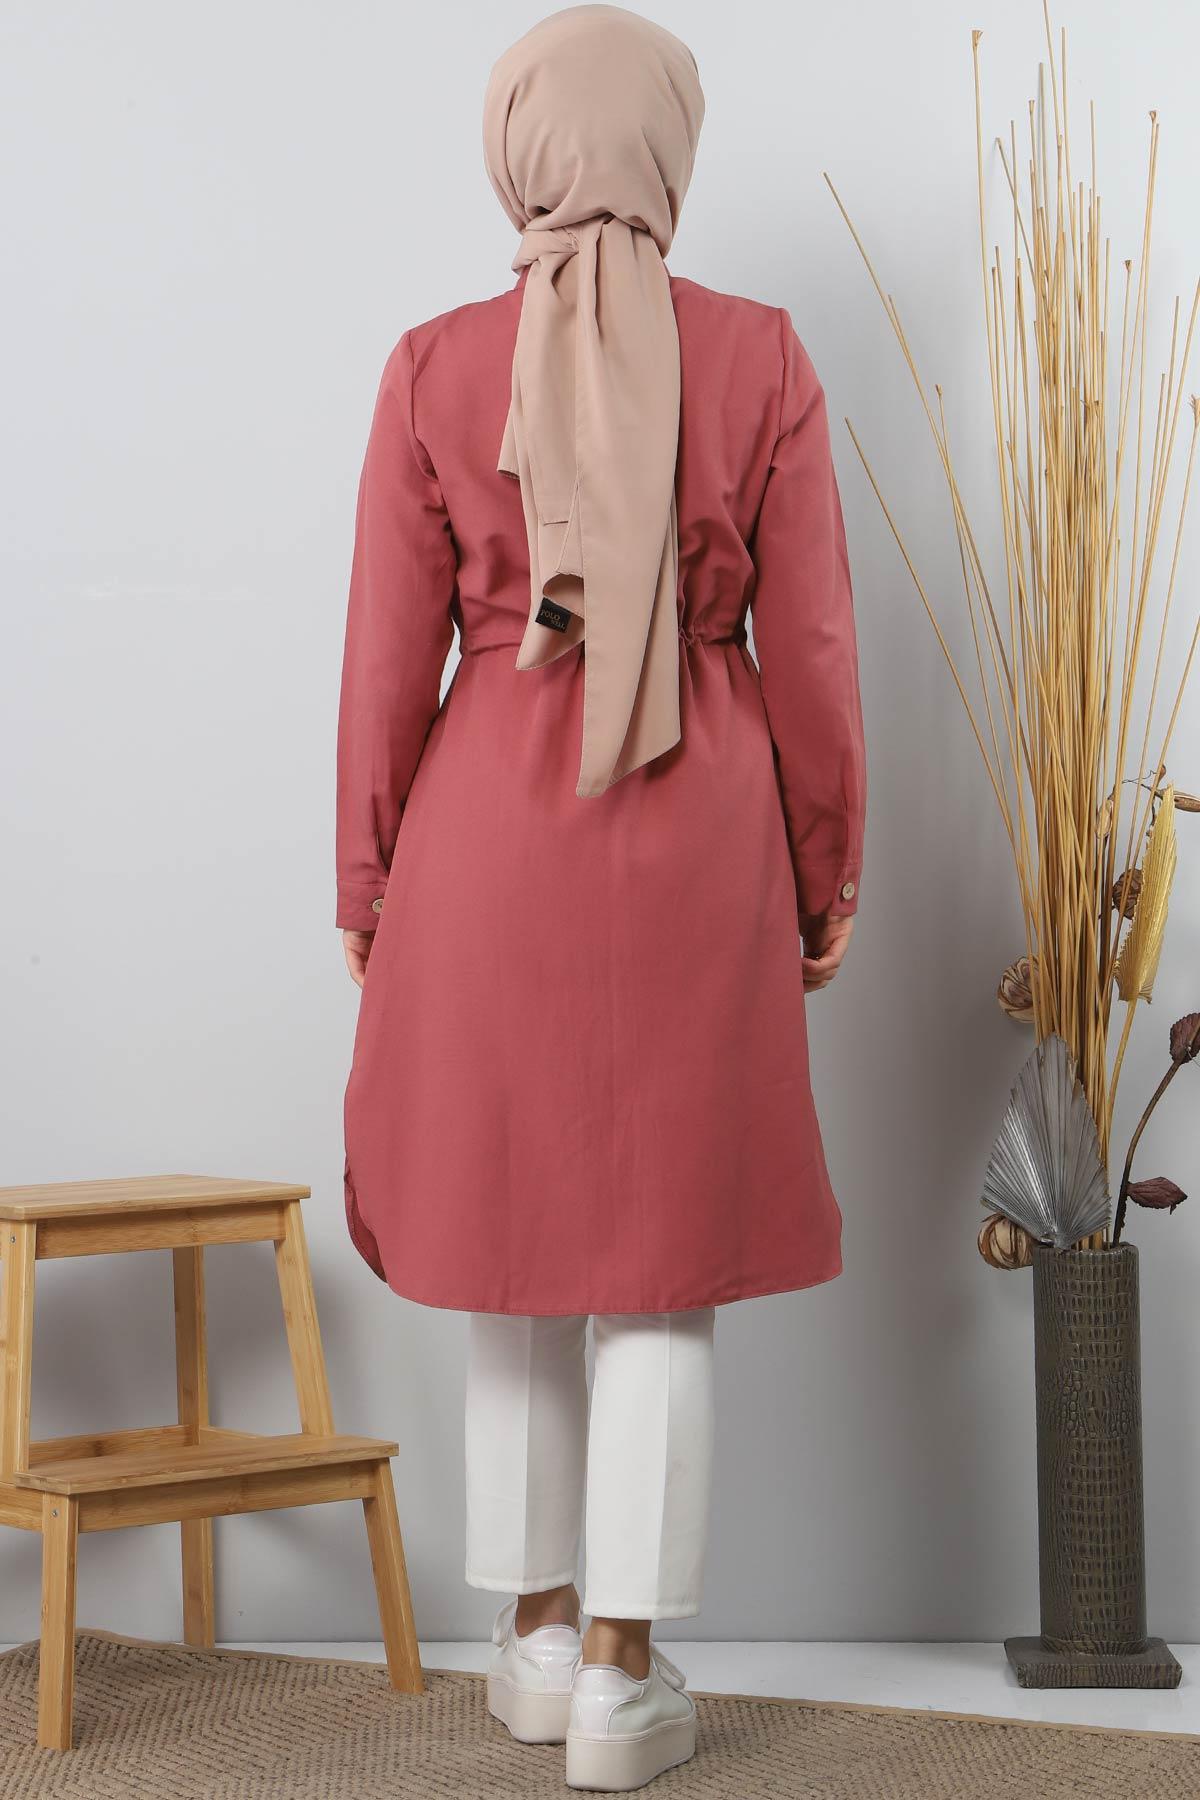 Tie Waist Tunic TSD1612 Pomegranate Color.